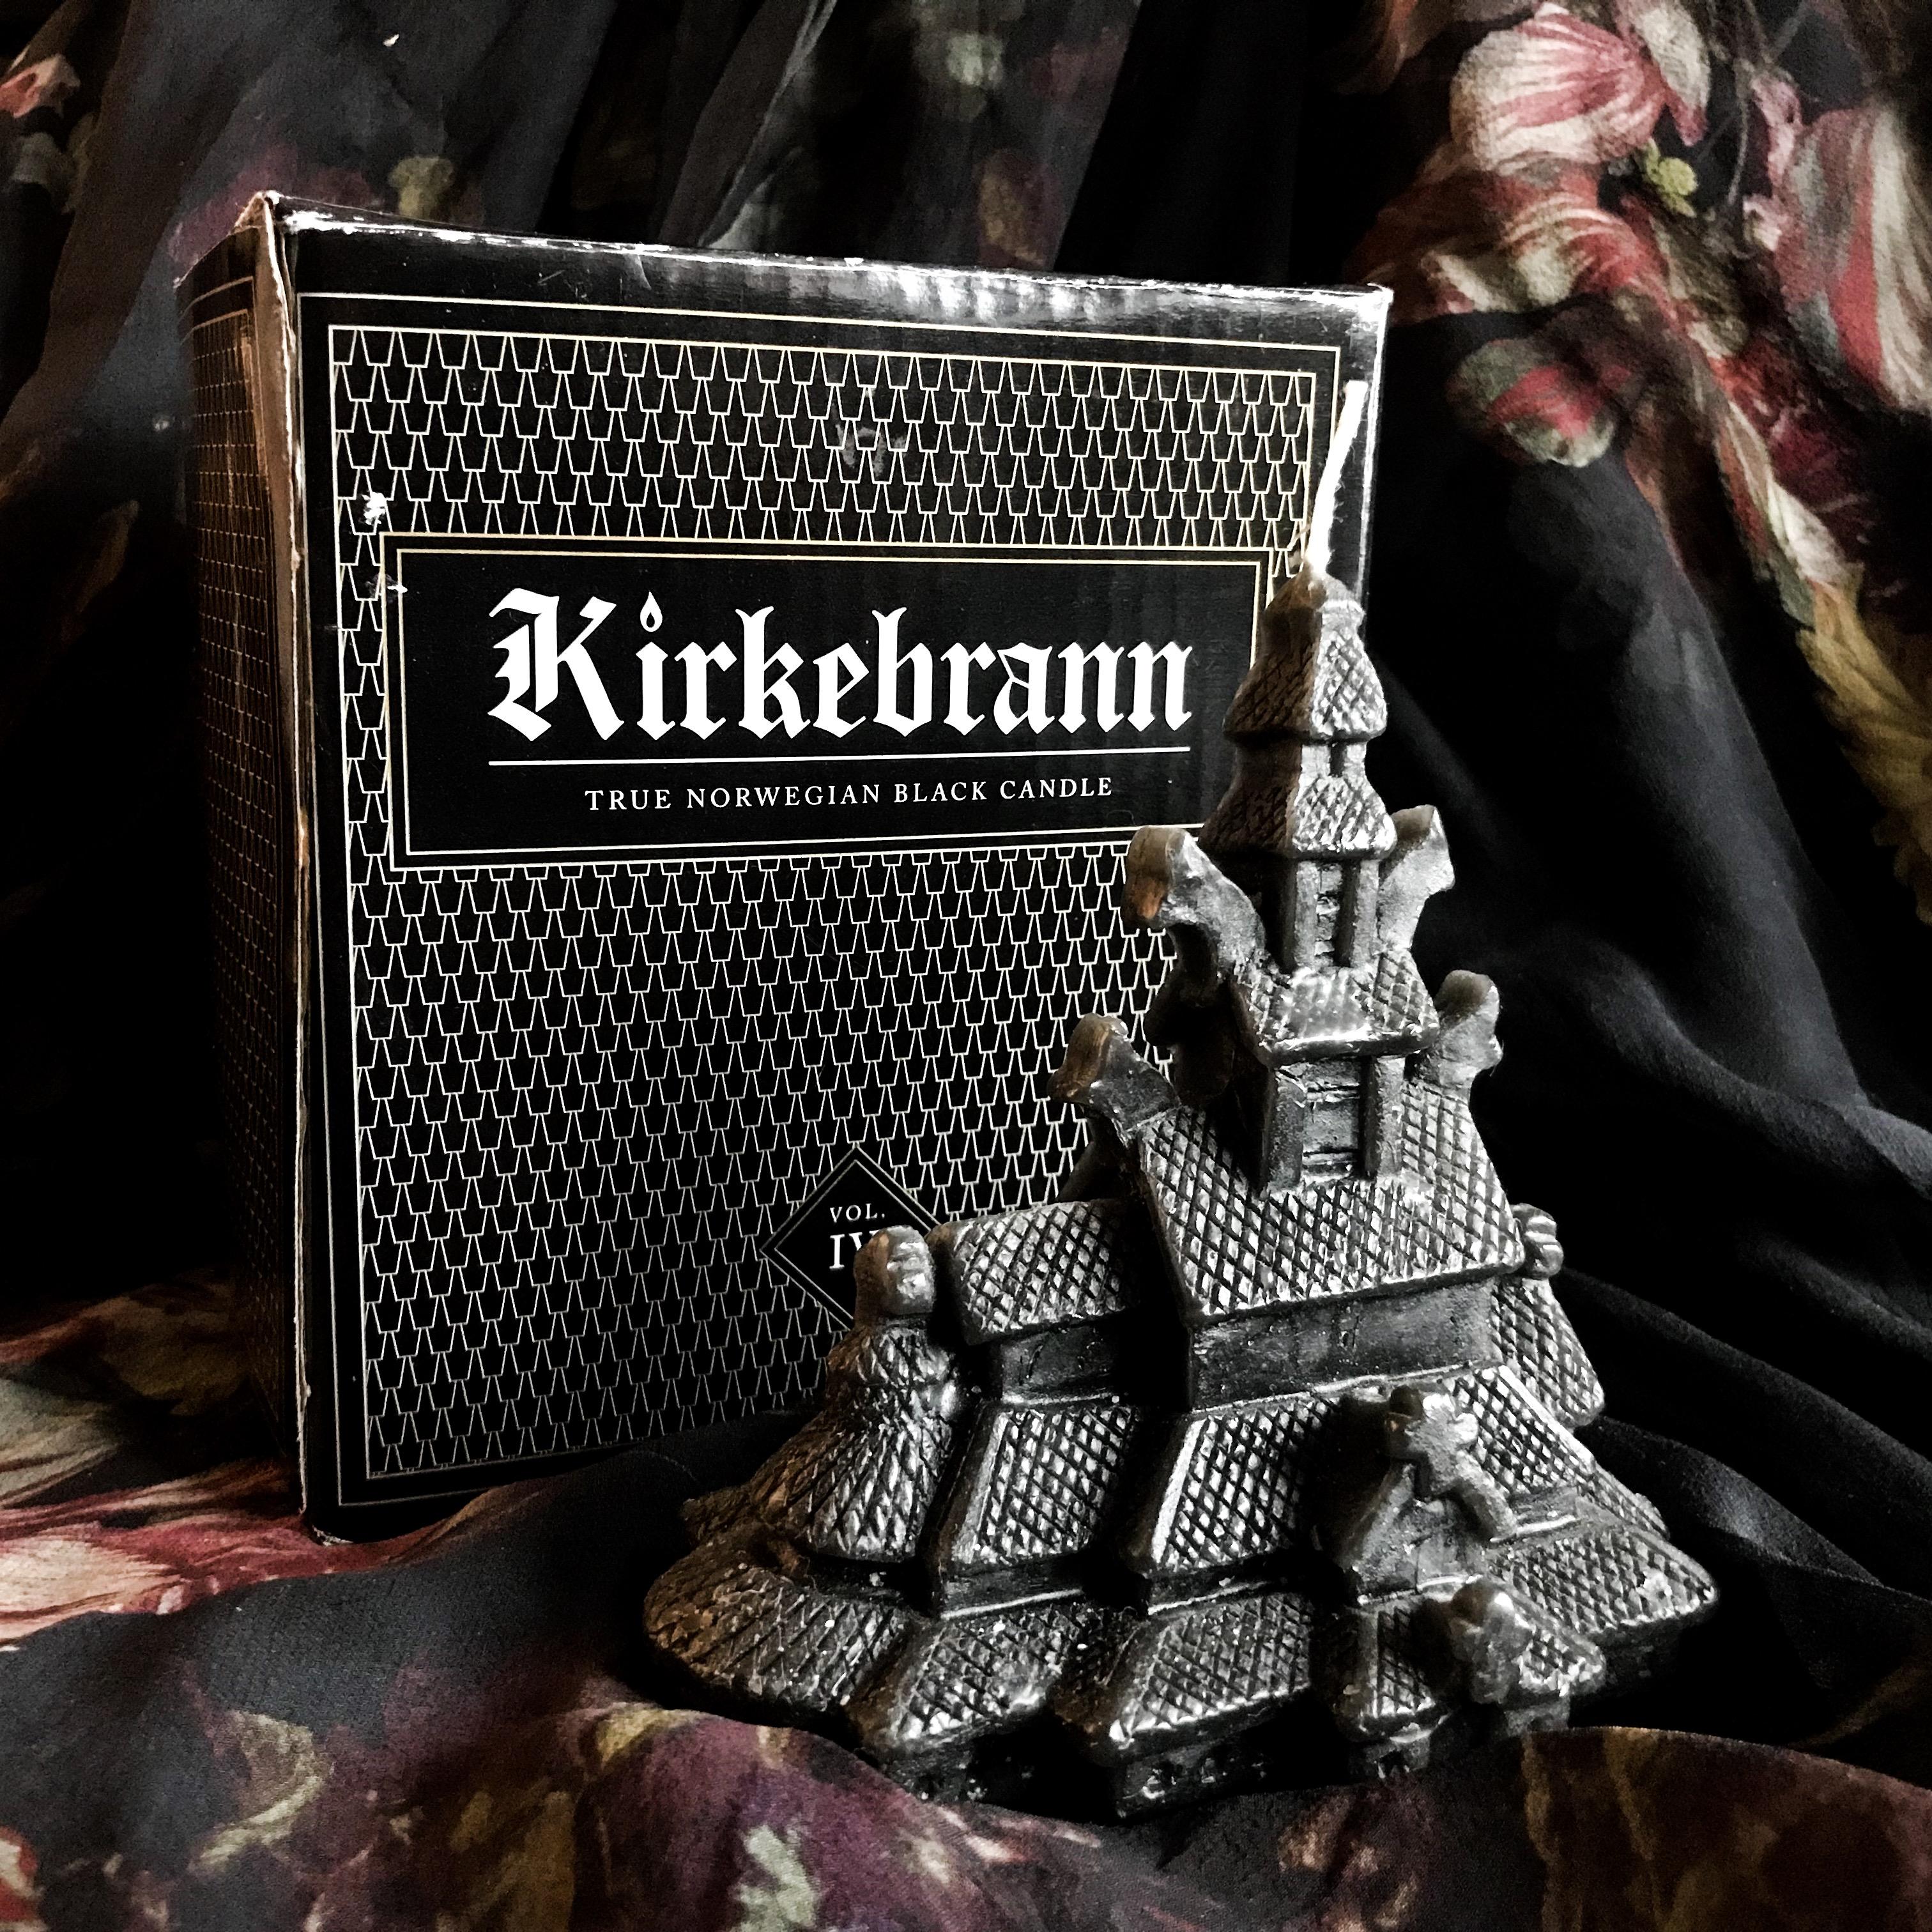 Kirkebrann True Norwegian Black Candle